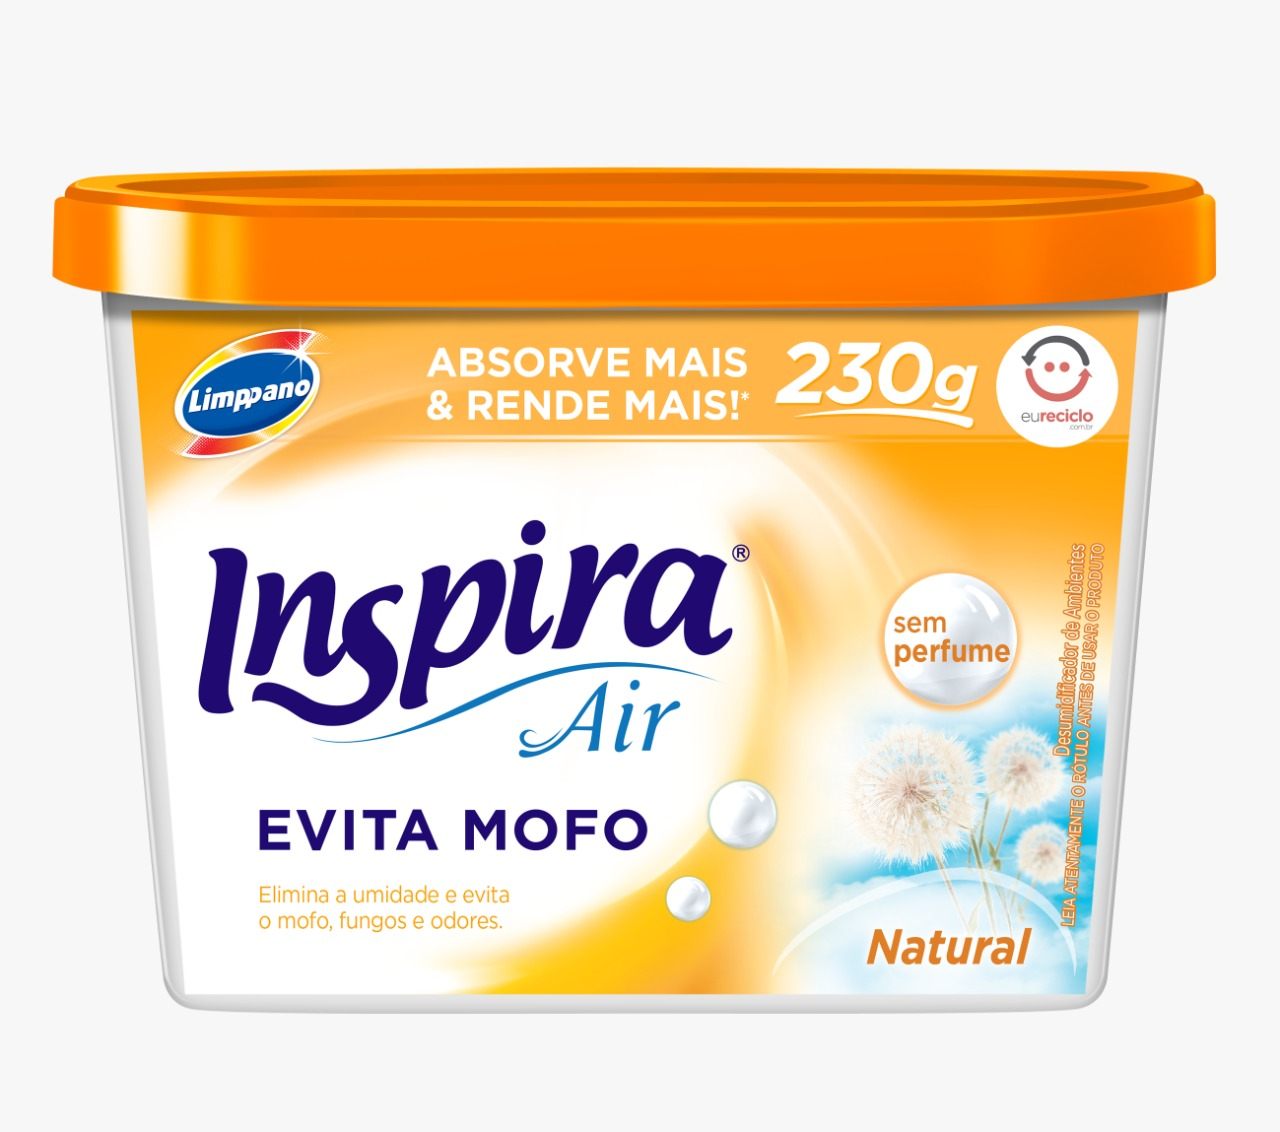 EVITA MOFO INSPIRA NATURAL 1X230GR(12)